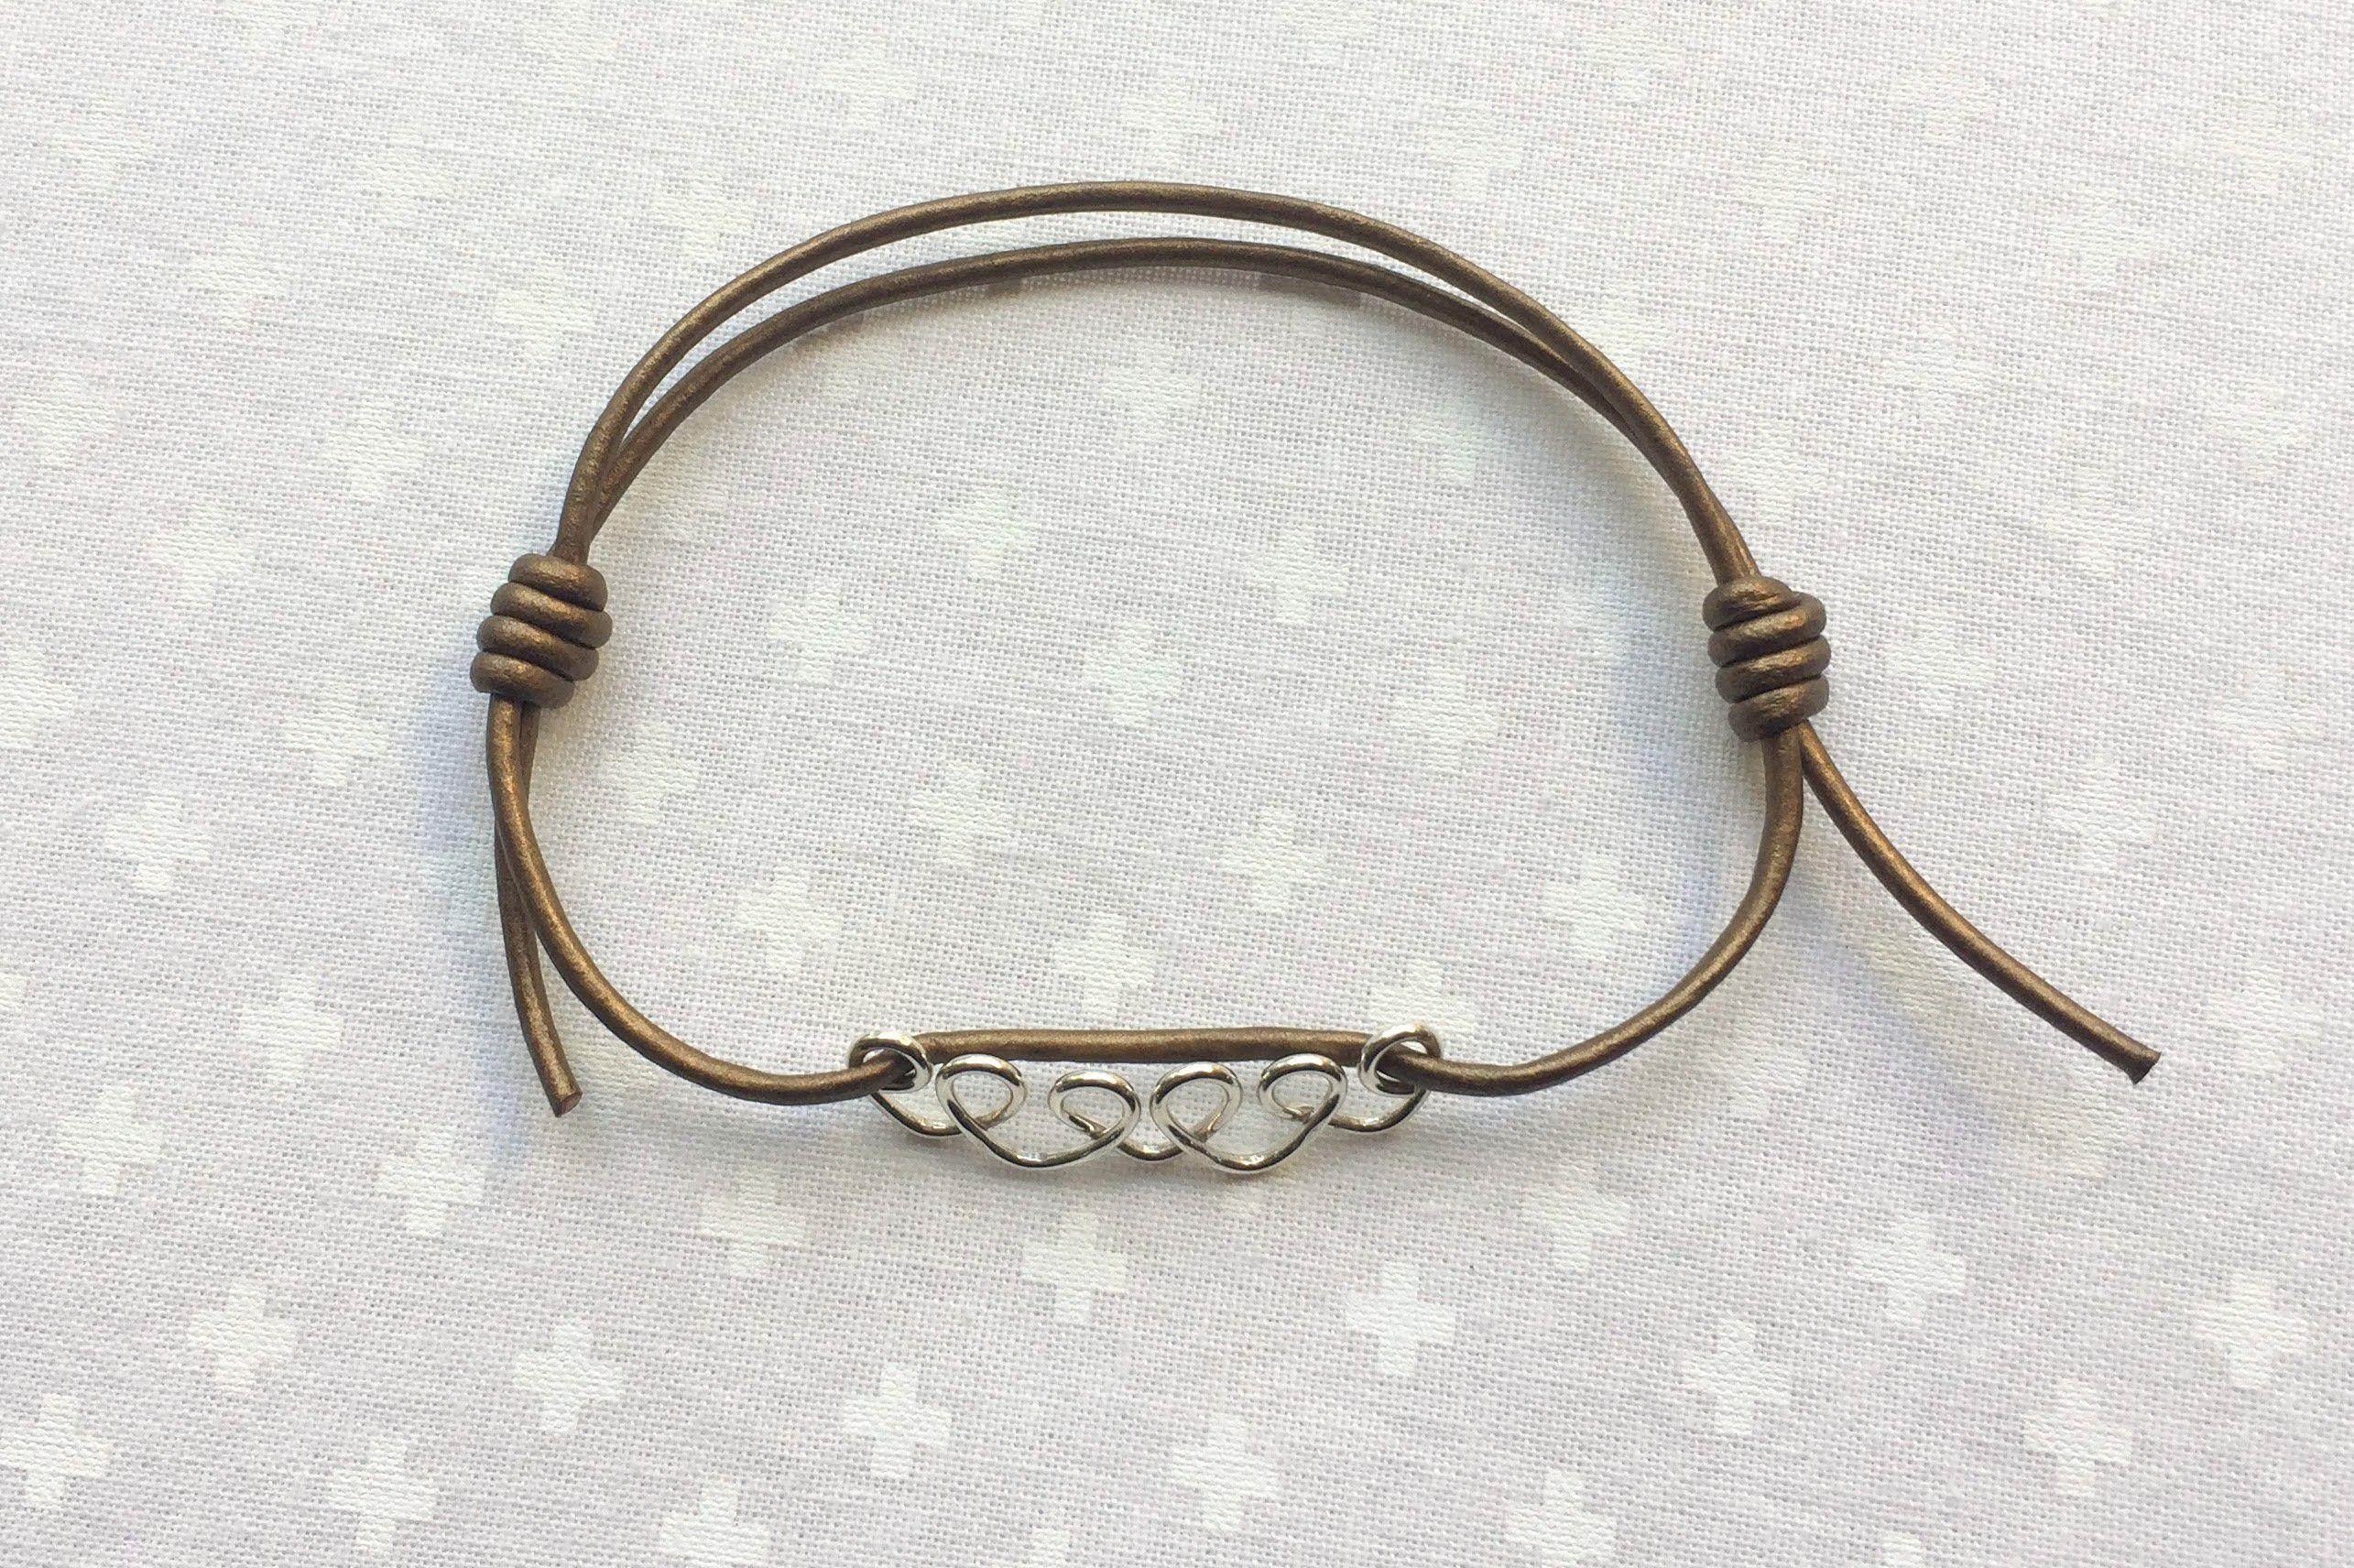 Using the sliding knots for an adjustable bracelet